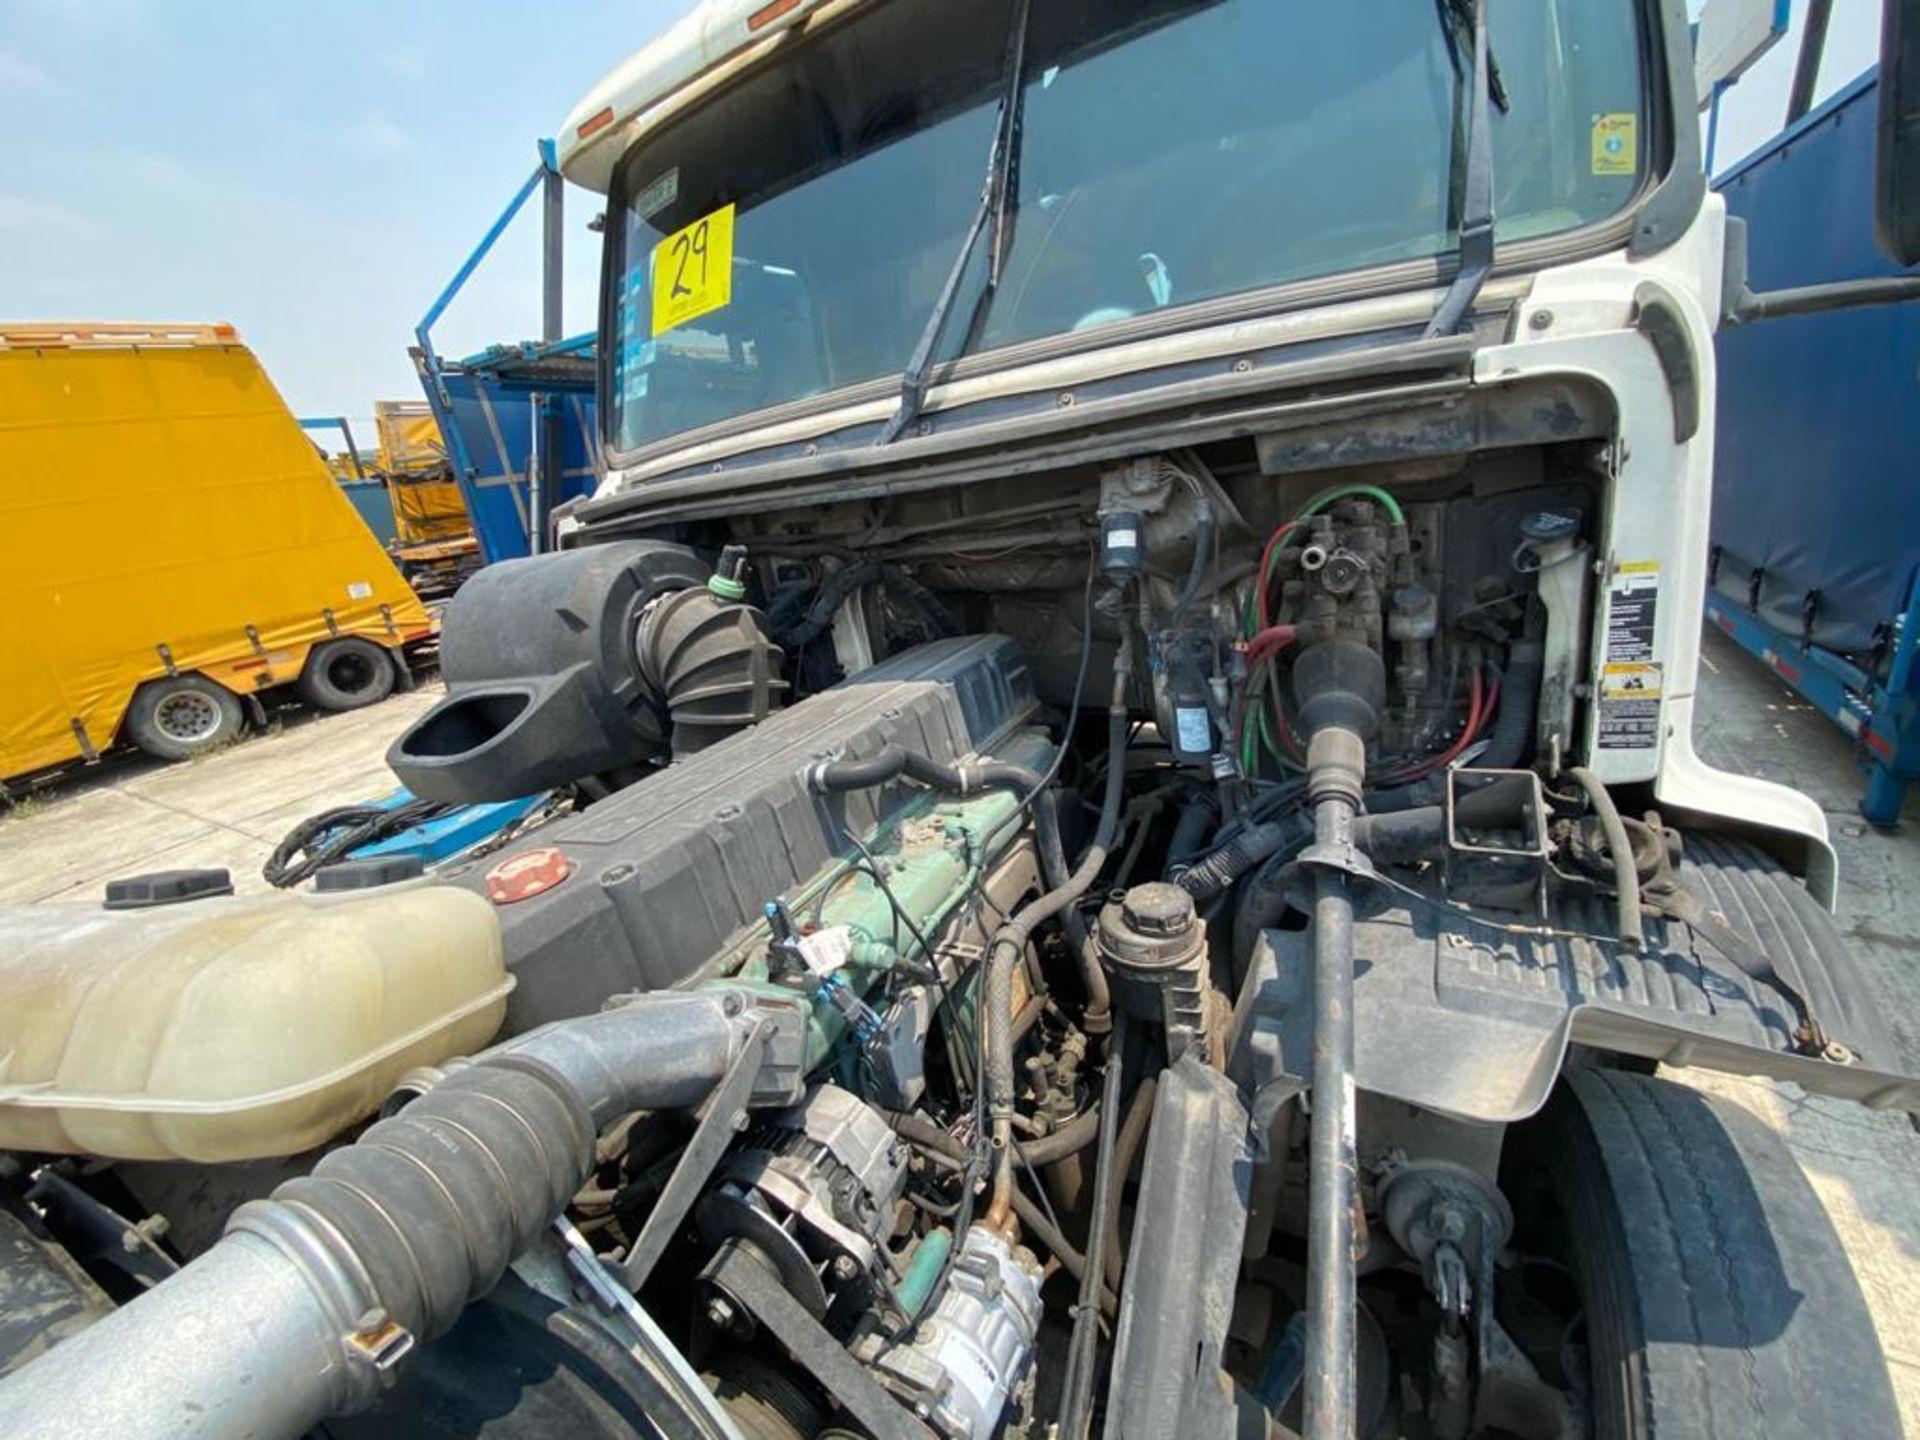 2001 Volvo Sleeper Truck Tractor, estándar transmissión of 18 speeds, with Volvo motor - Image 38 of 60